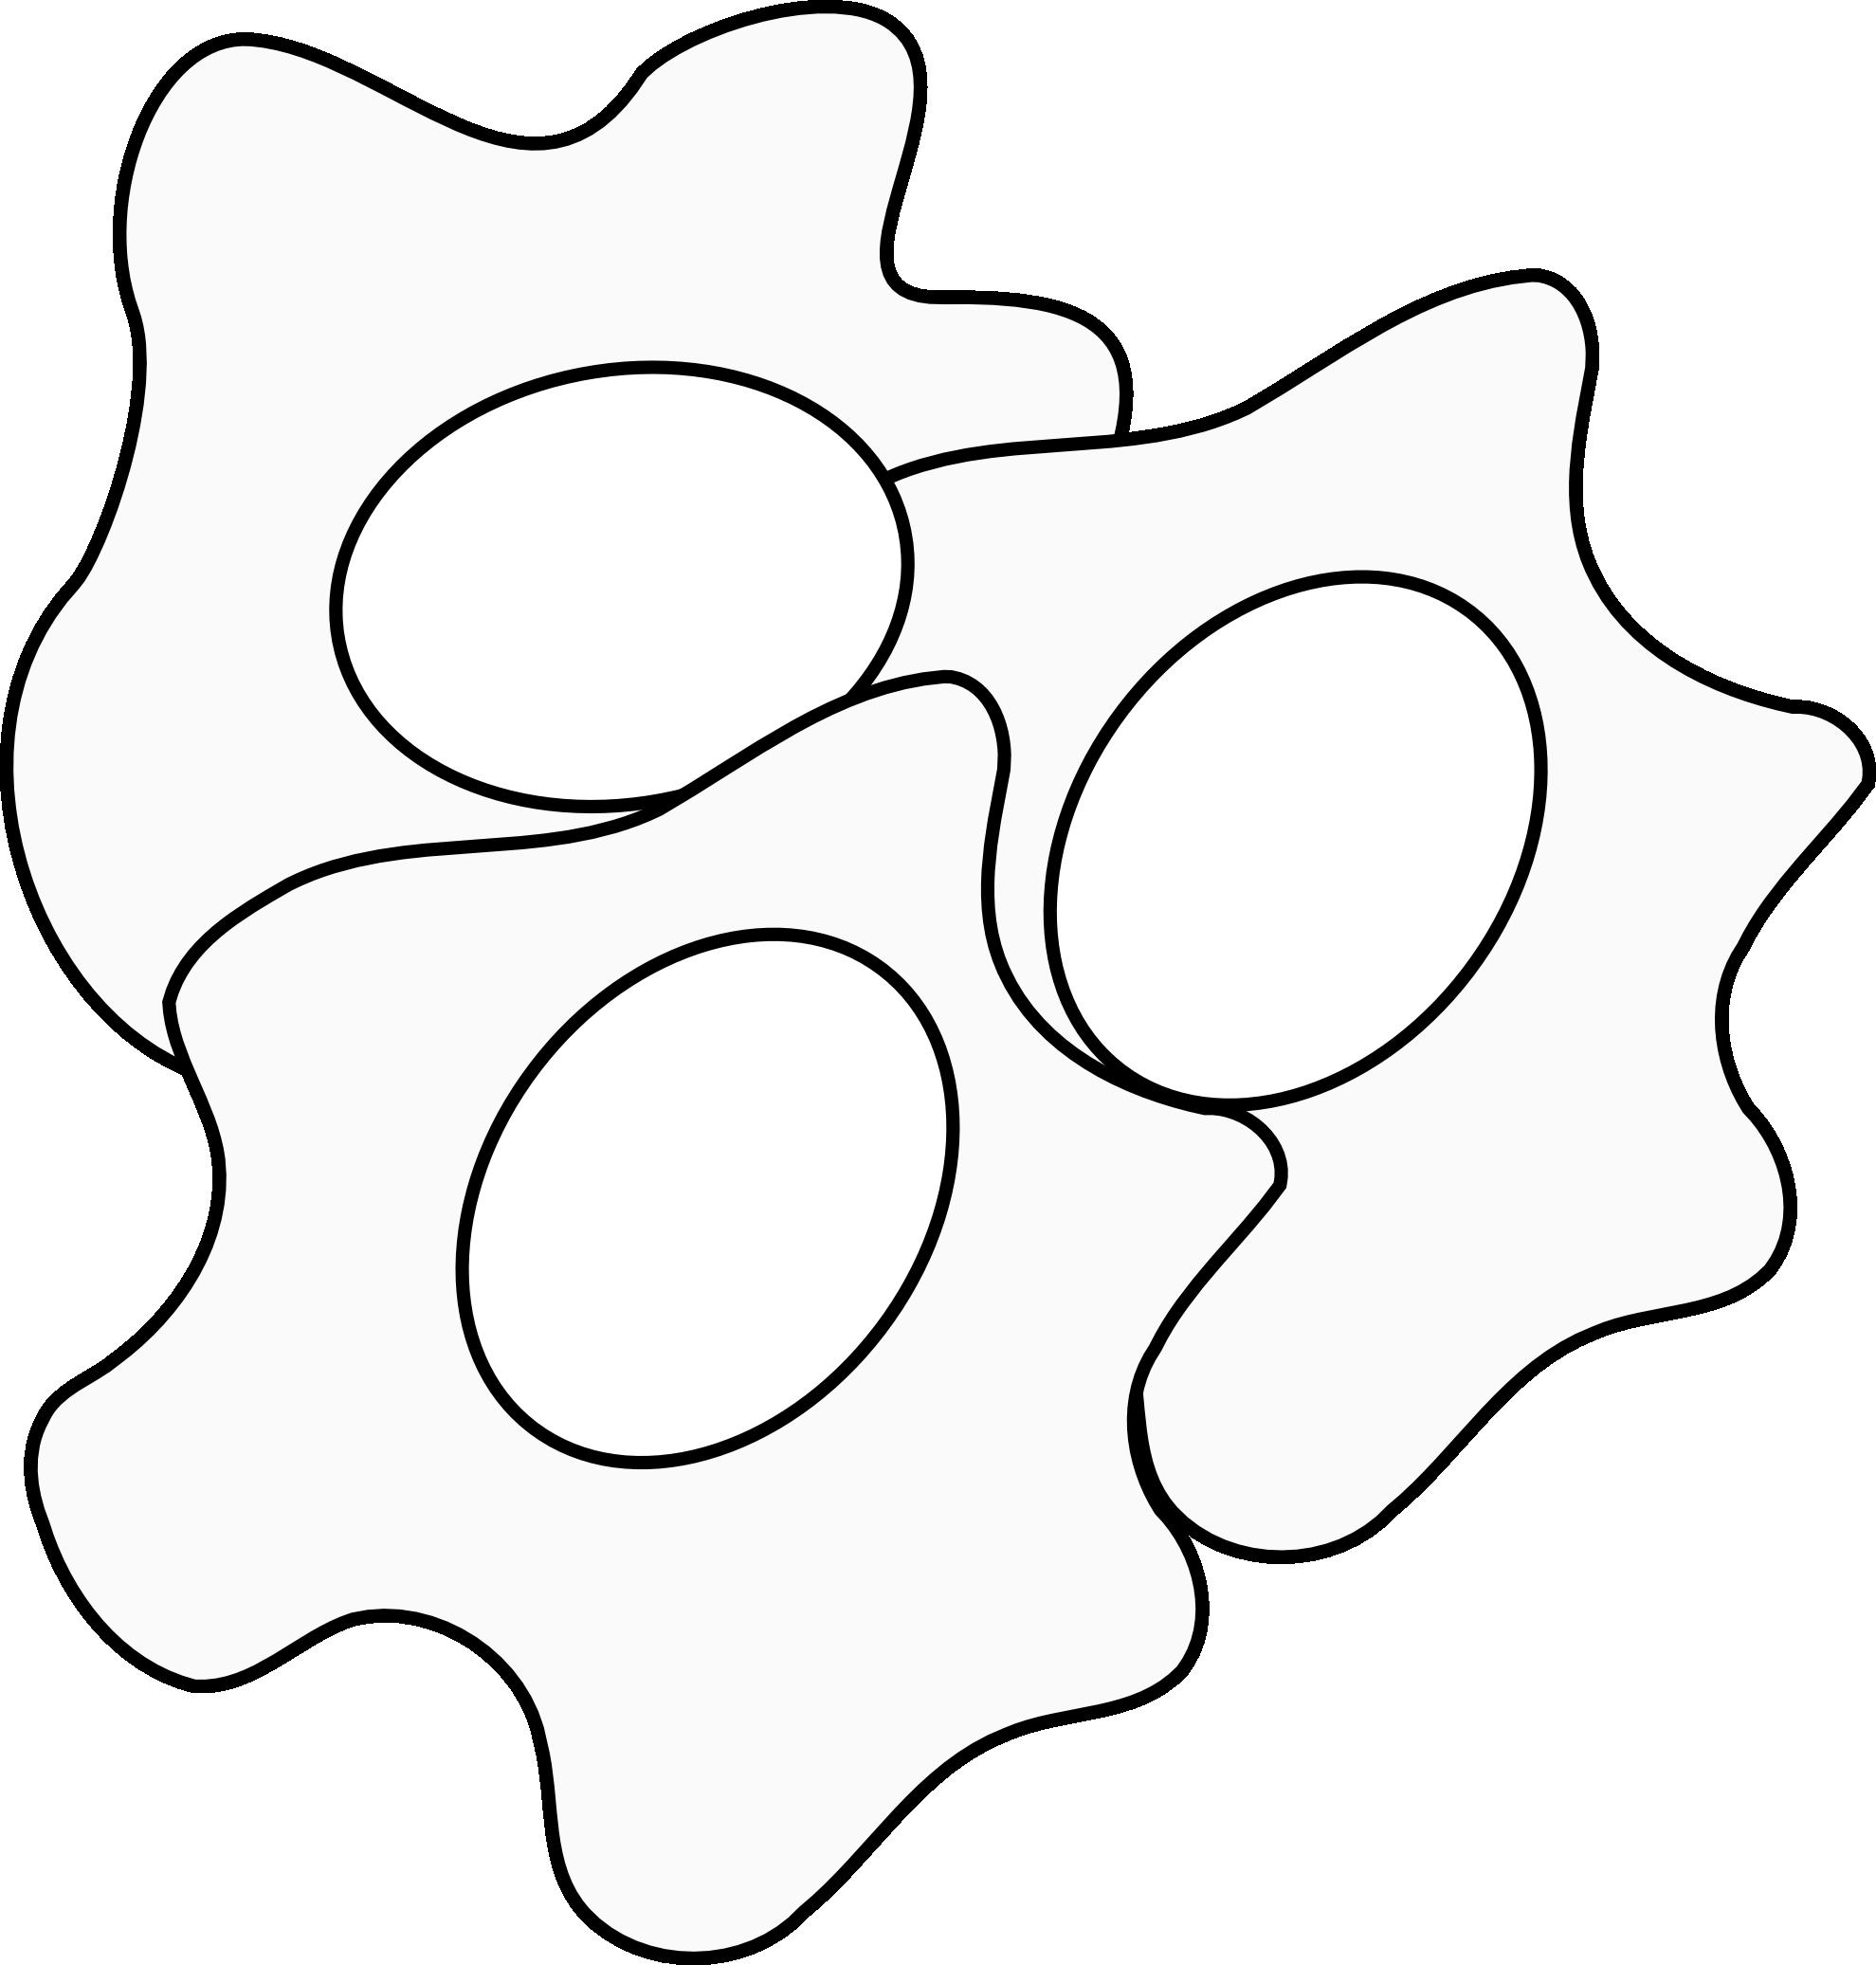 1979x2073 Egg Black And White Clipart 2074549